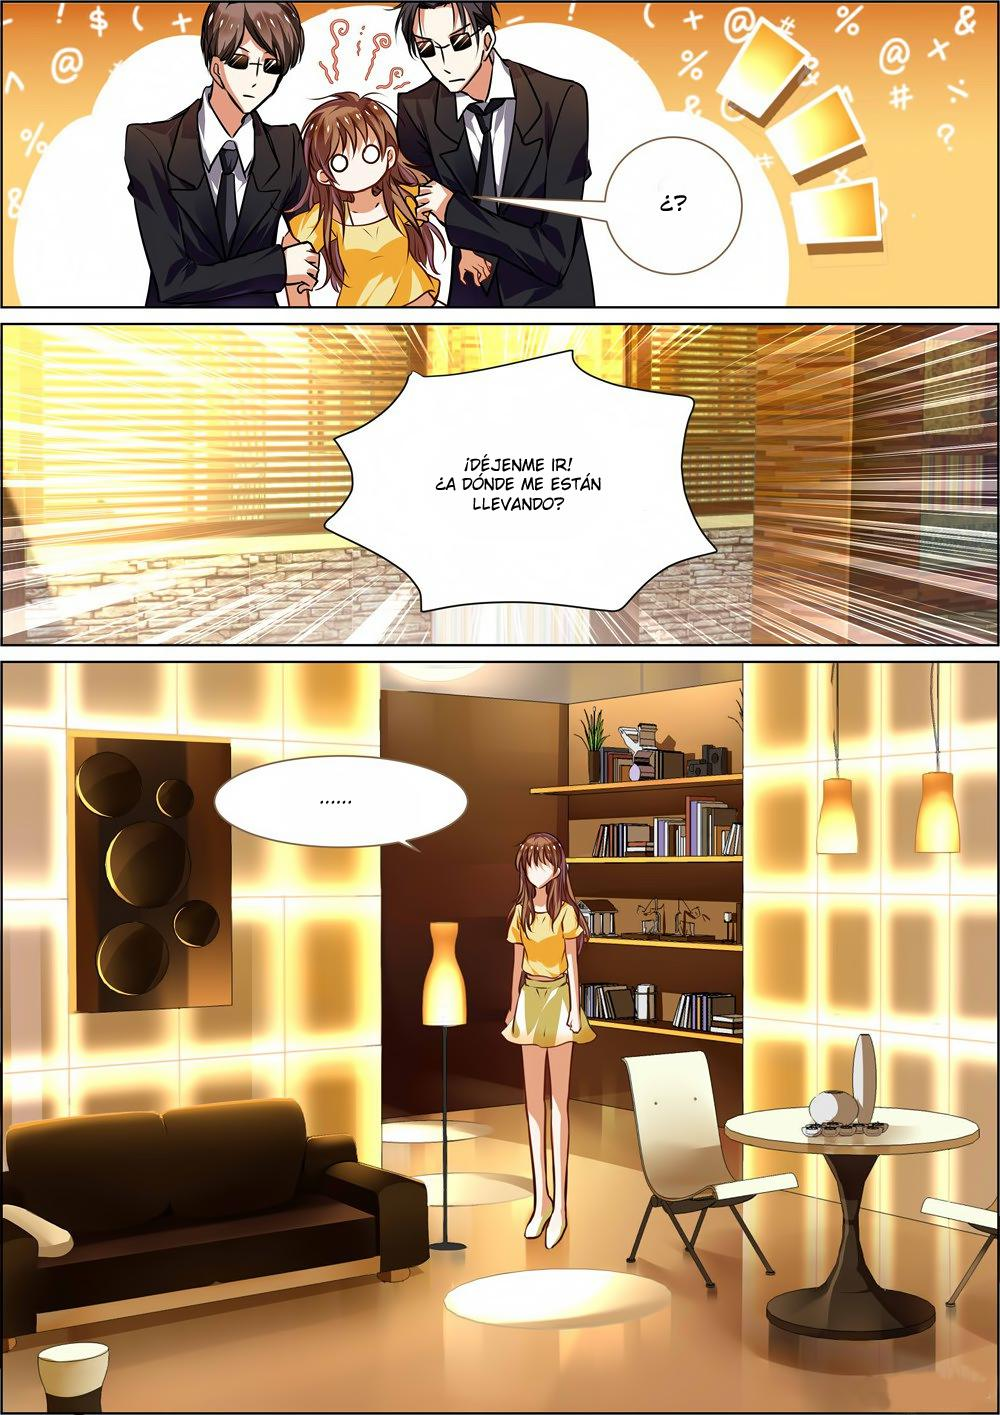 http://c5.ninemanga.com/es_manga/5/16069/385054/a7f0629e8d022060a6d2d8783be9cc68.jpg Page 5